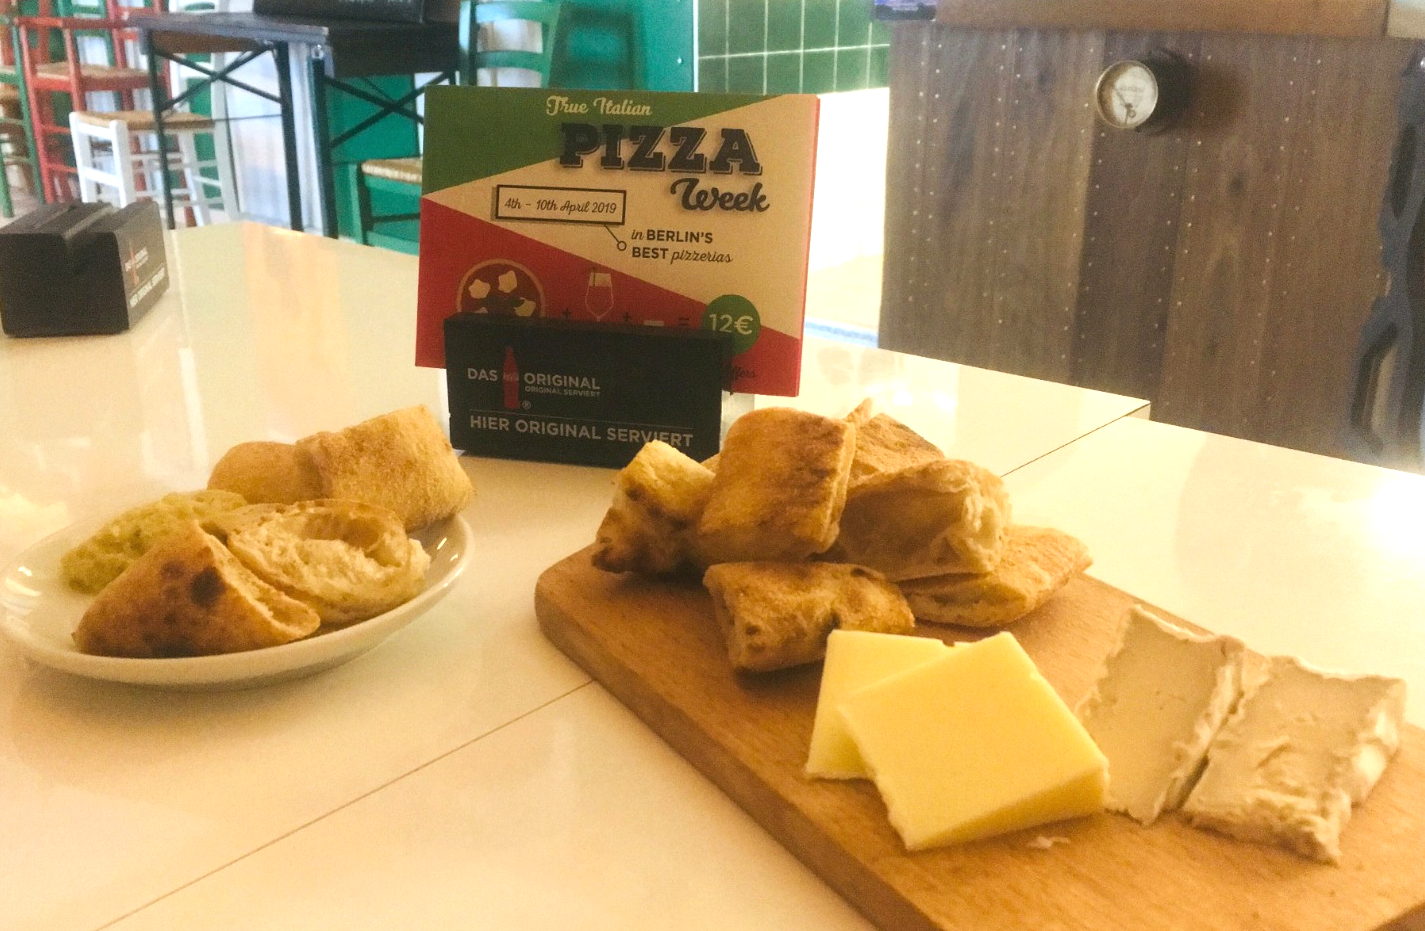 Pizzare-Vegan-Foccacia-and-cheese